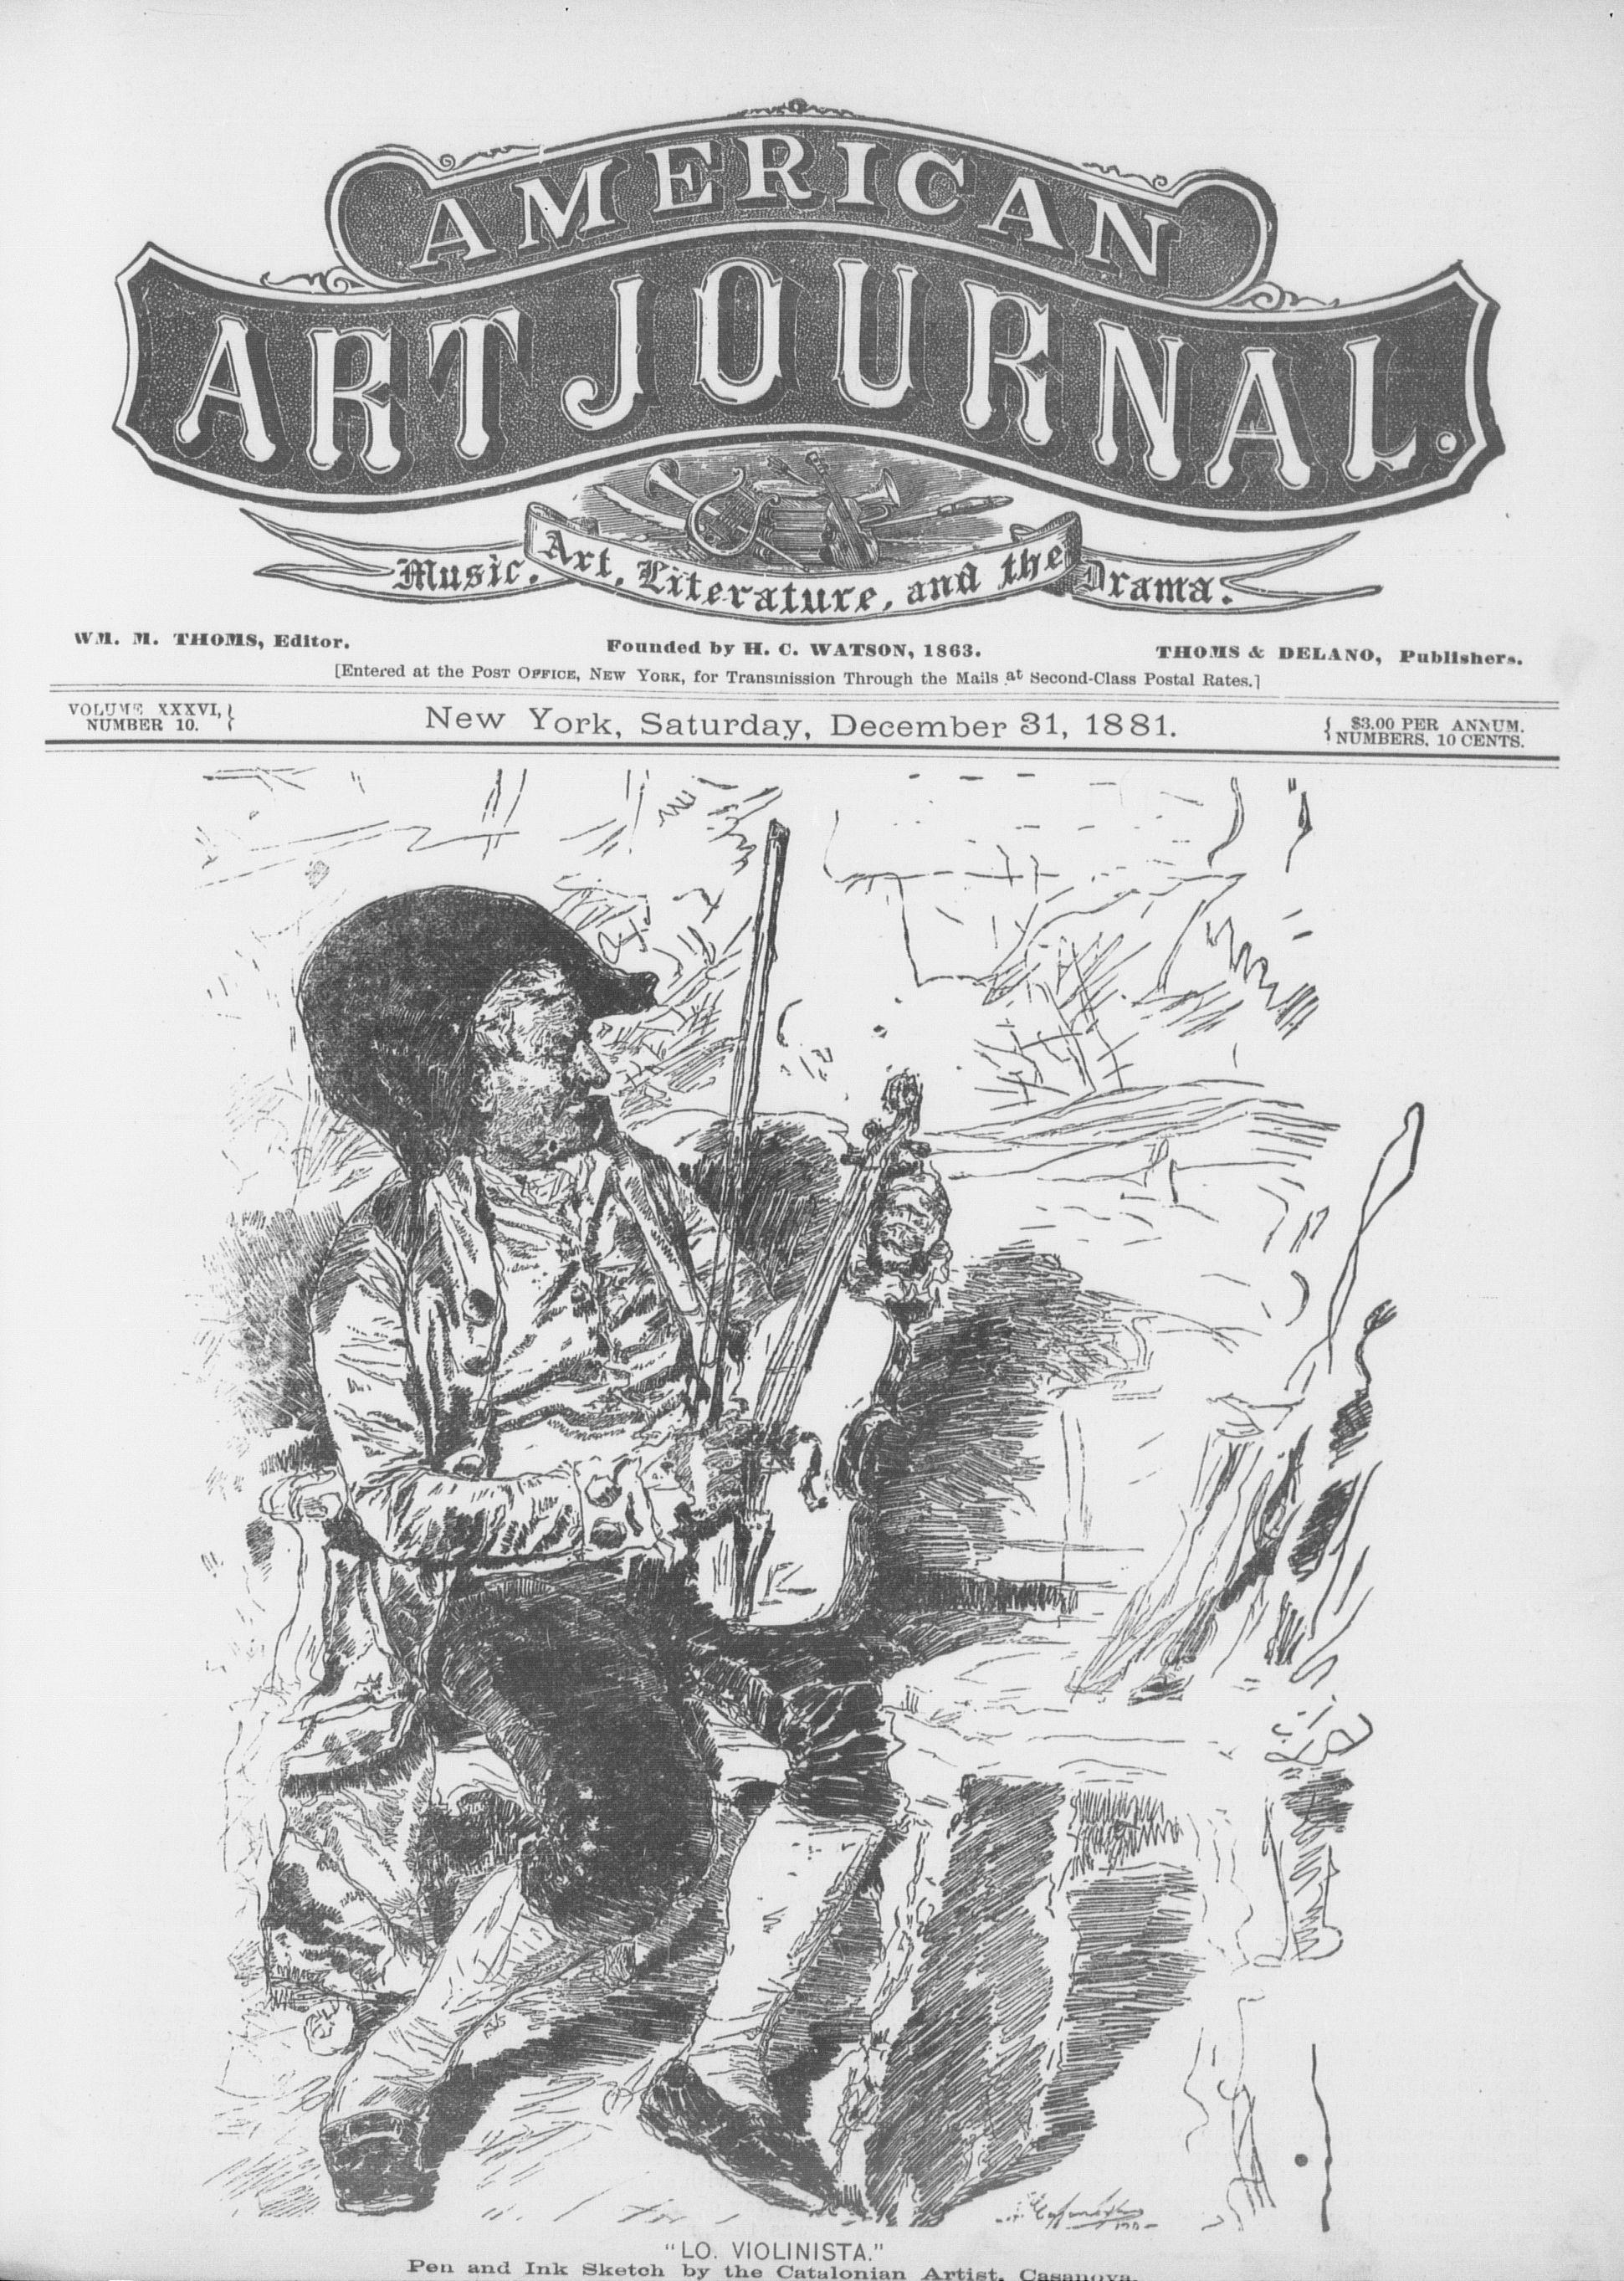 American Art Journal, Vol  36, no  23, December 31, 1881